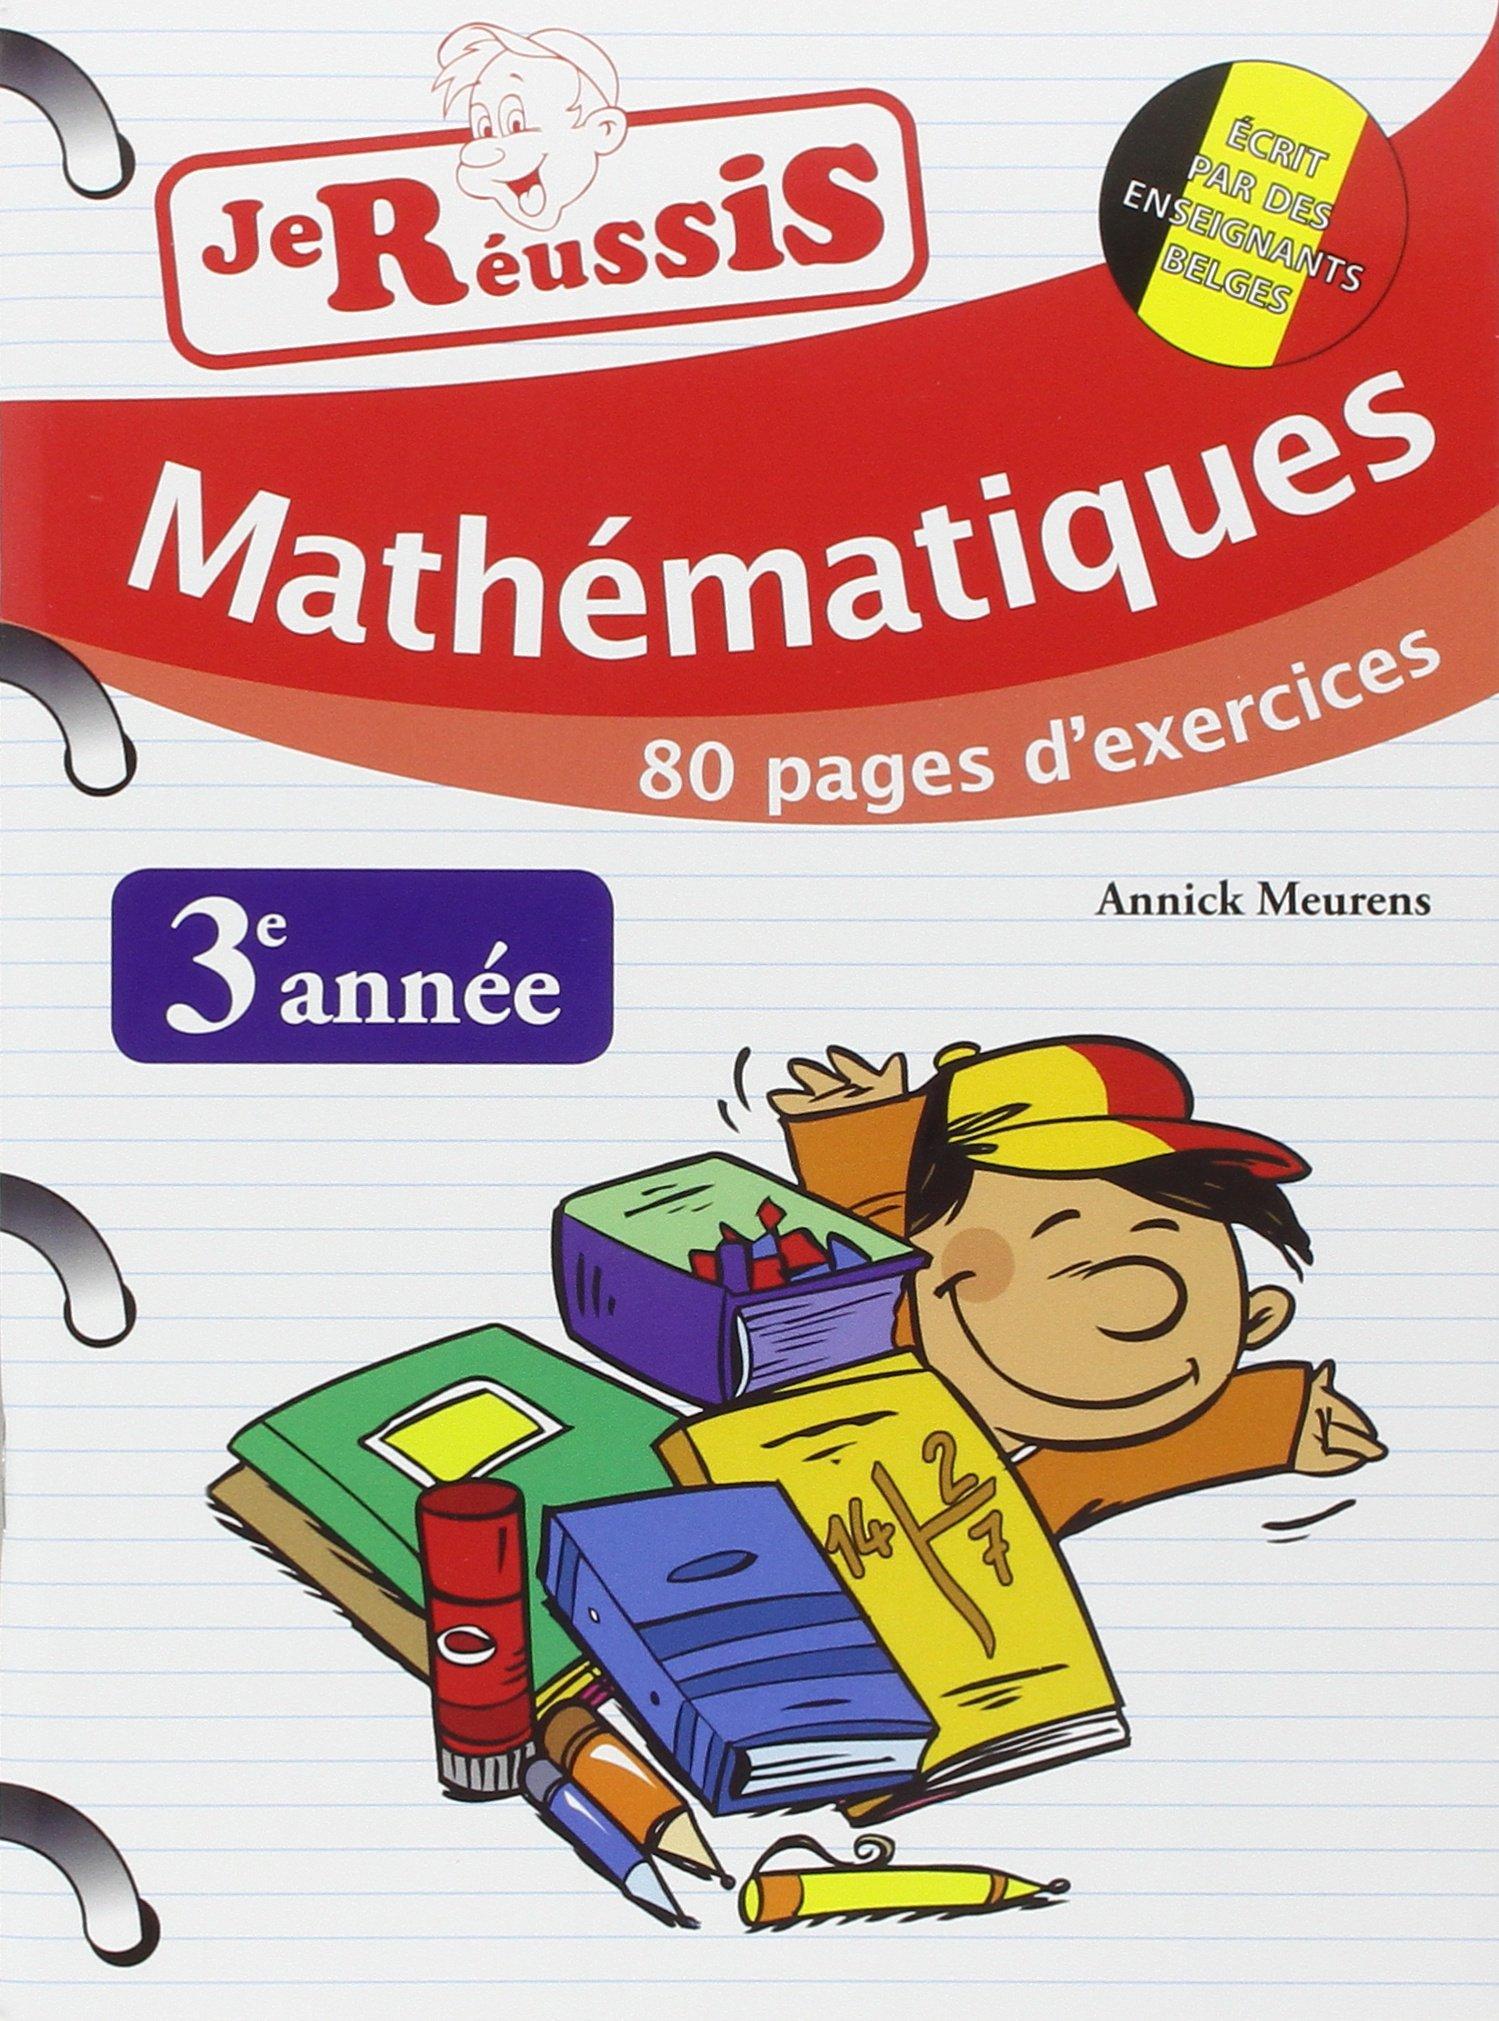 Amazon Co Jp Je Reussis Maths 3eme Annee Ɯ¬